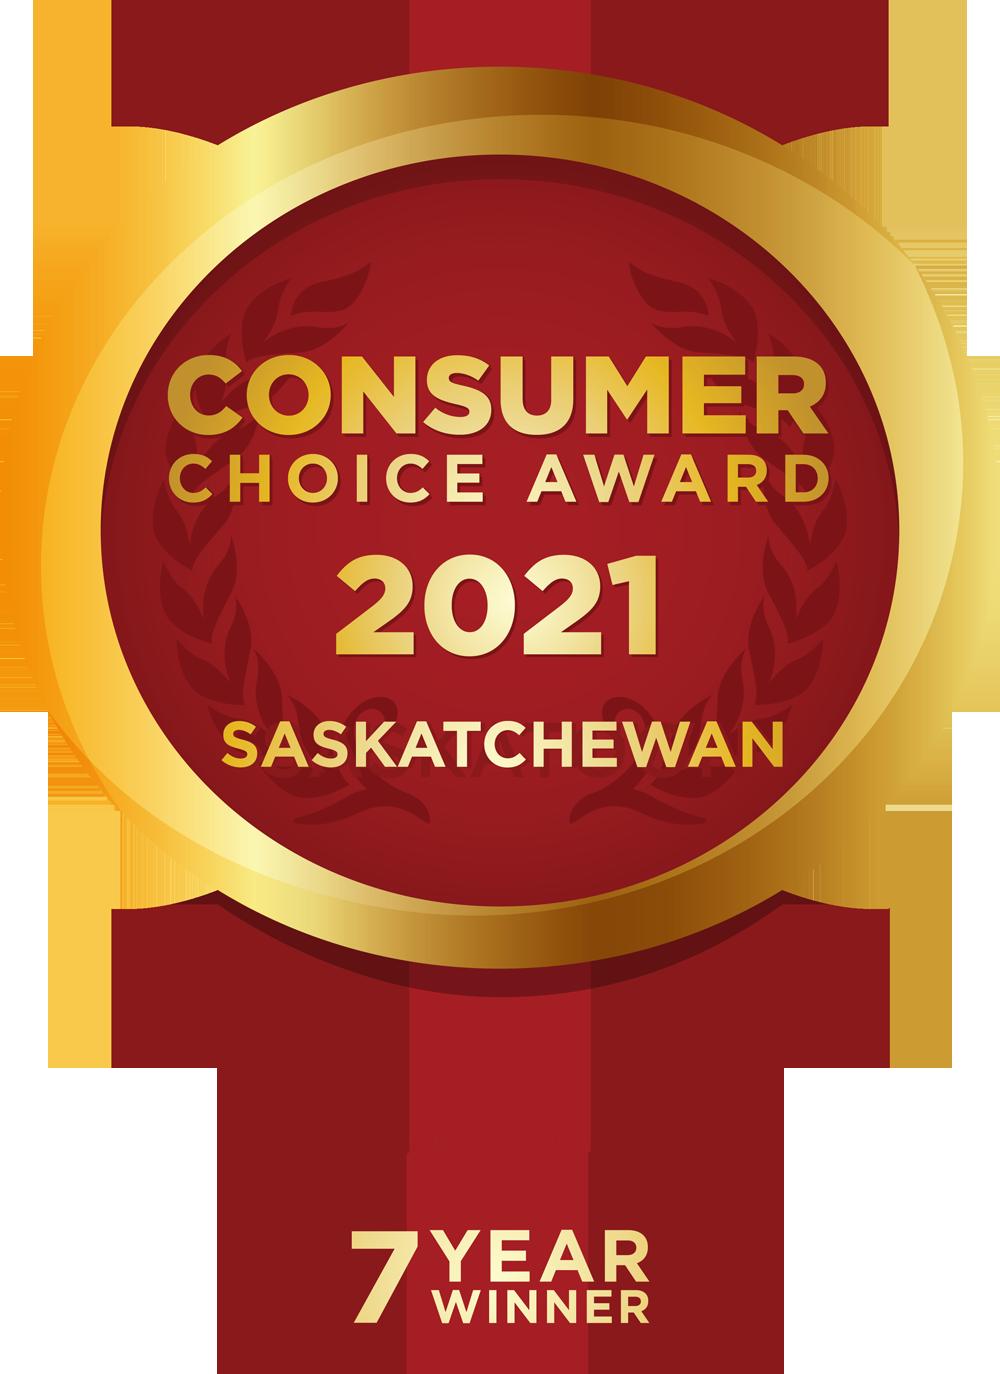 Consumer Choice Award - 7 Year Winner